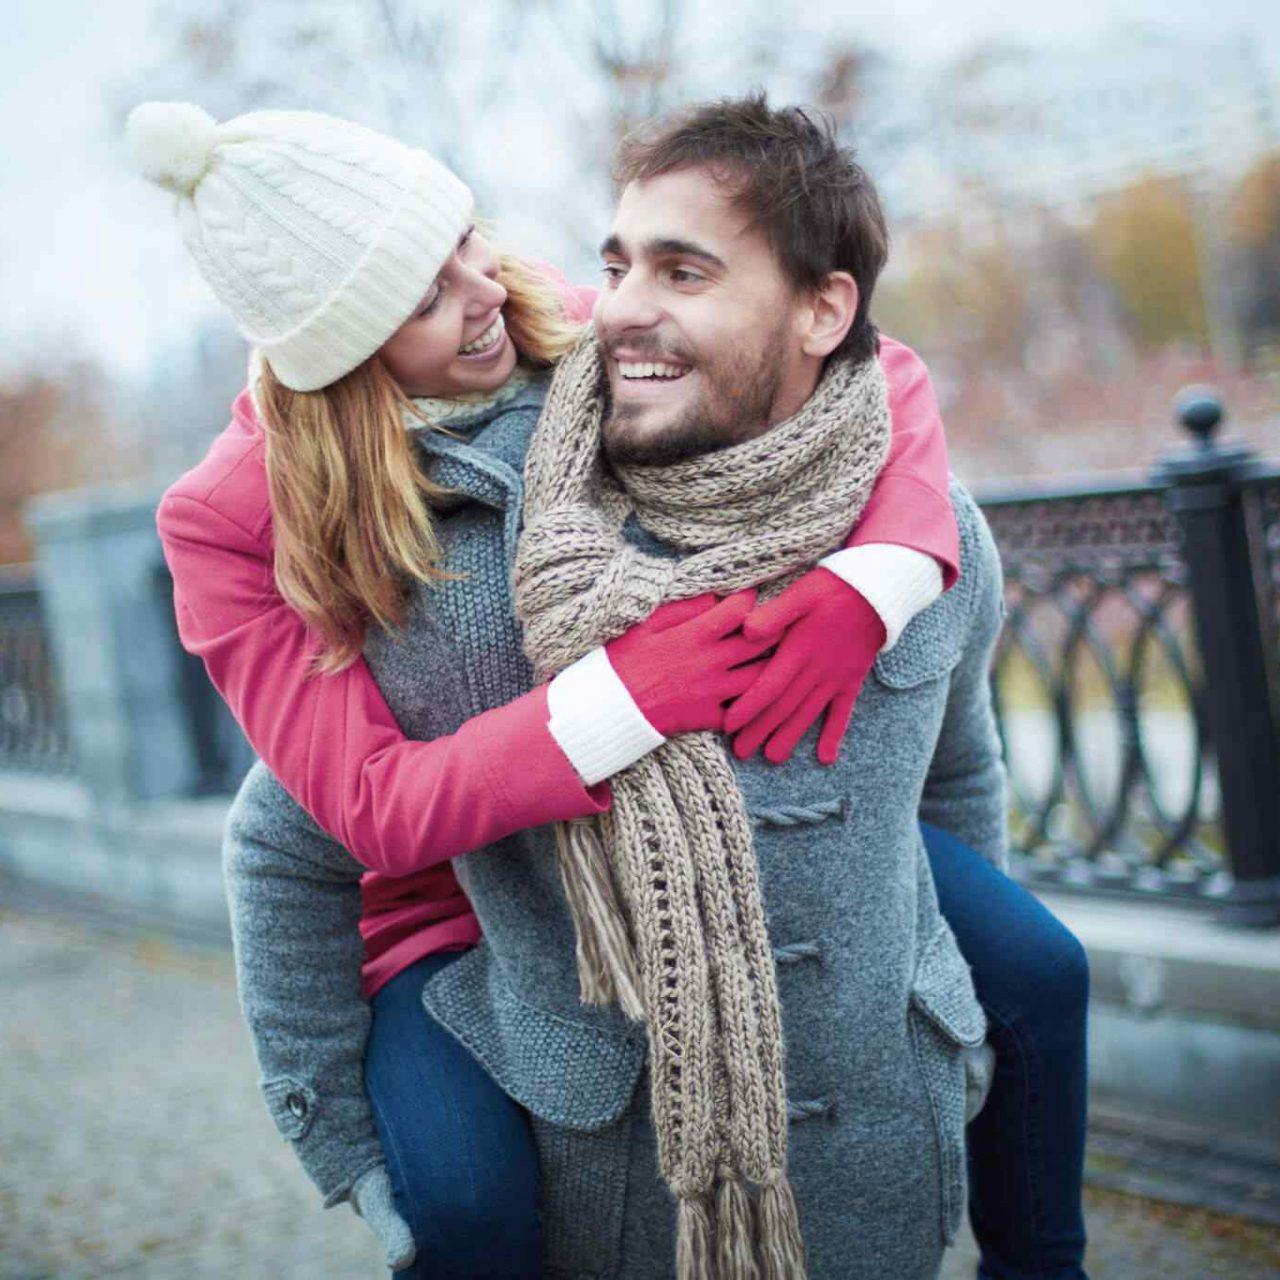 http://mirelasula.com/wp-content/uploads/2018/01/img-event-marriage-01-1280x1280.jpg